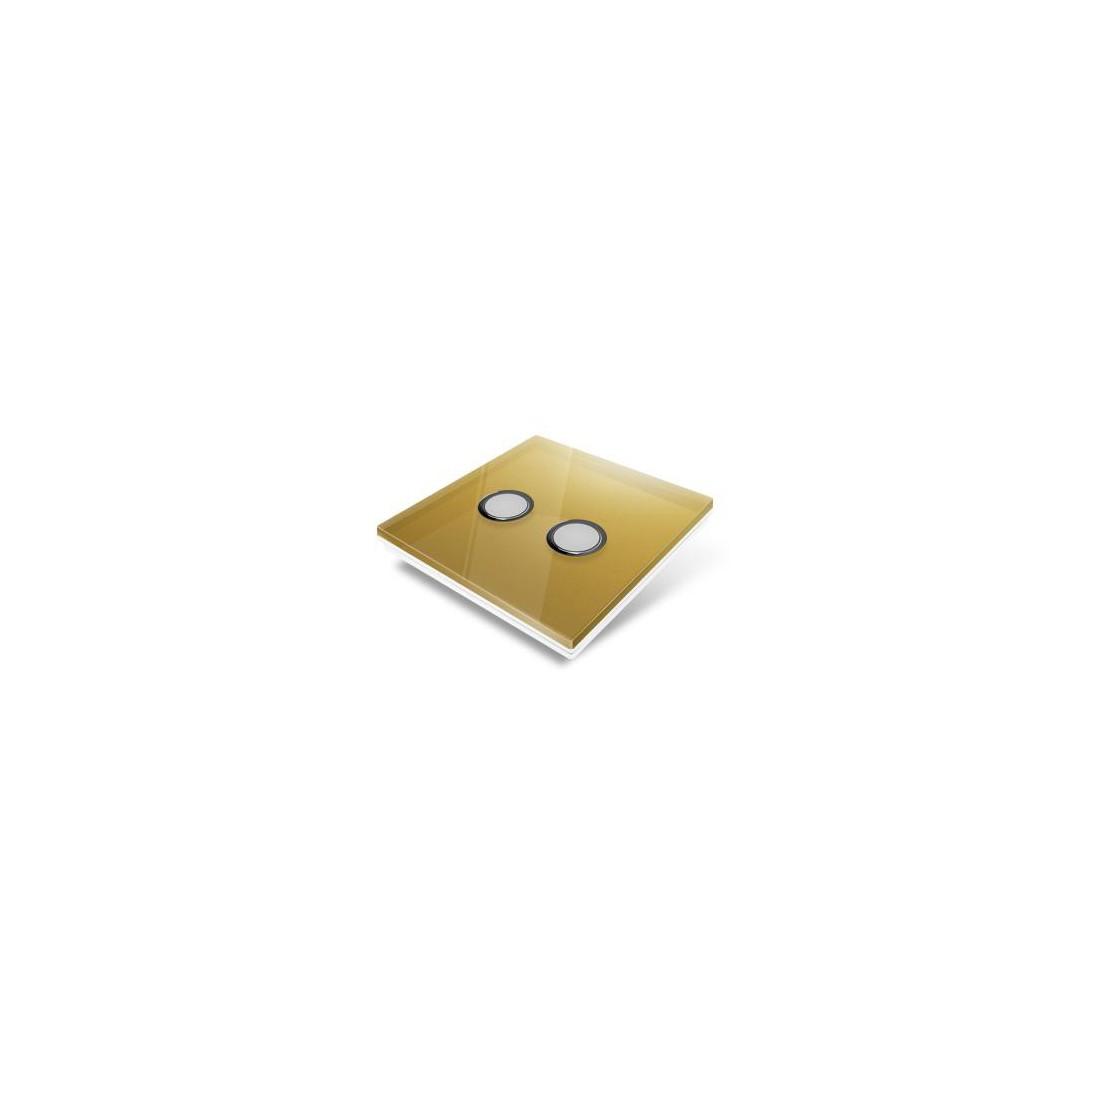 Afdekplaat voor Edisio-schakelaar - glas, goudkleurig